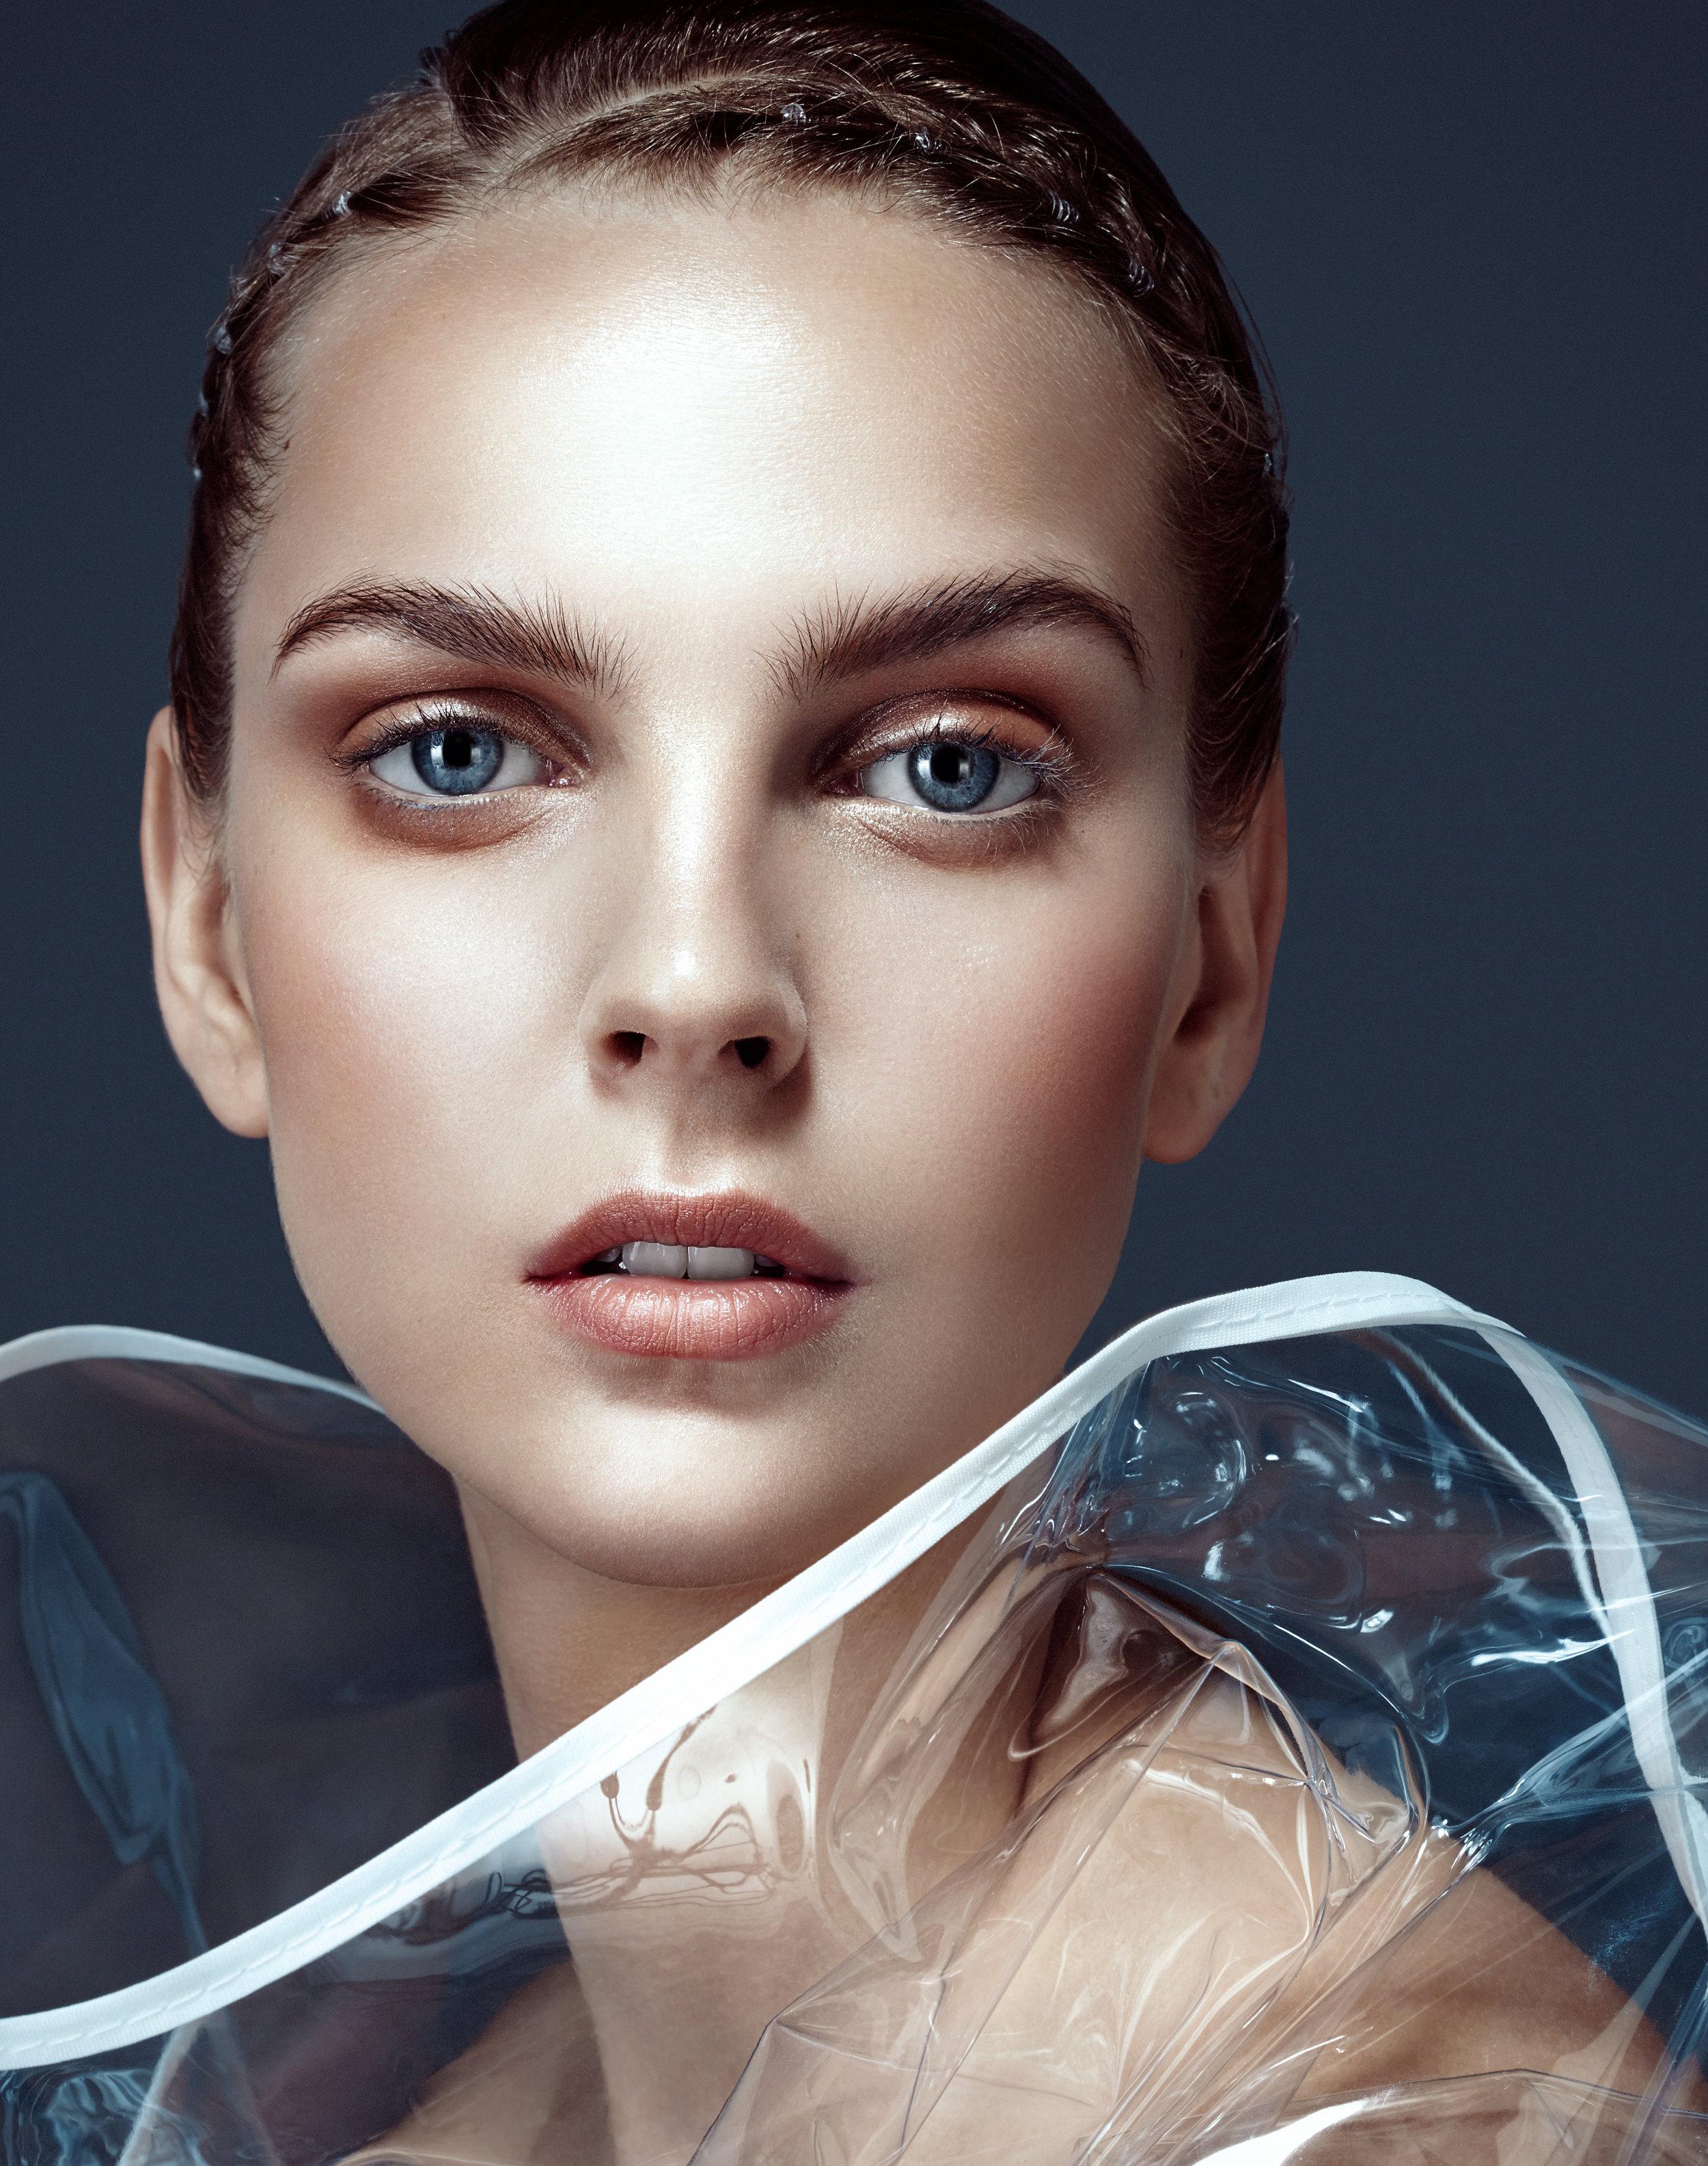 Anna Dabrowska beauty 068.jpg